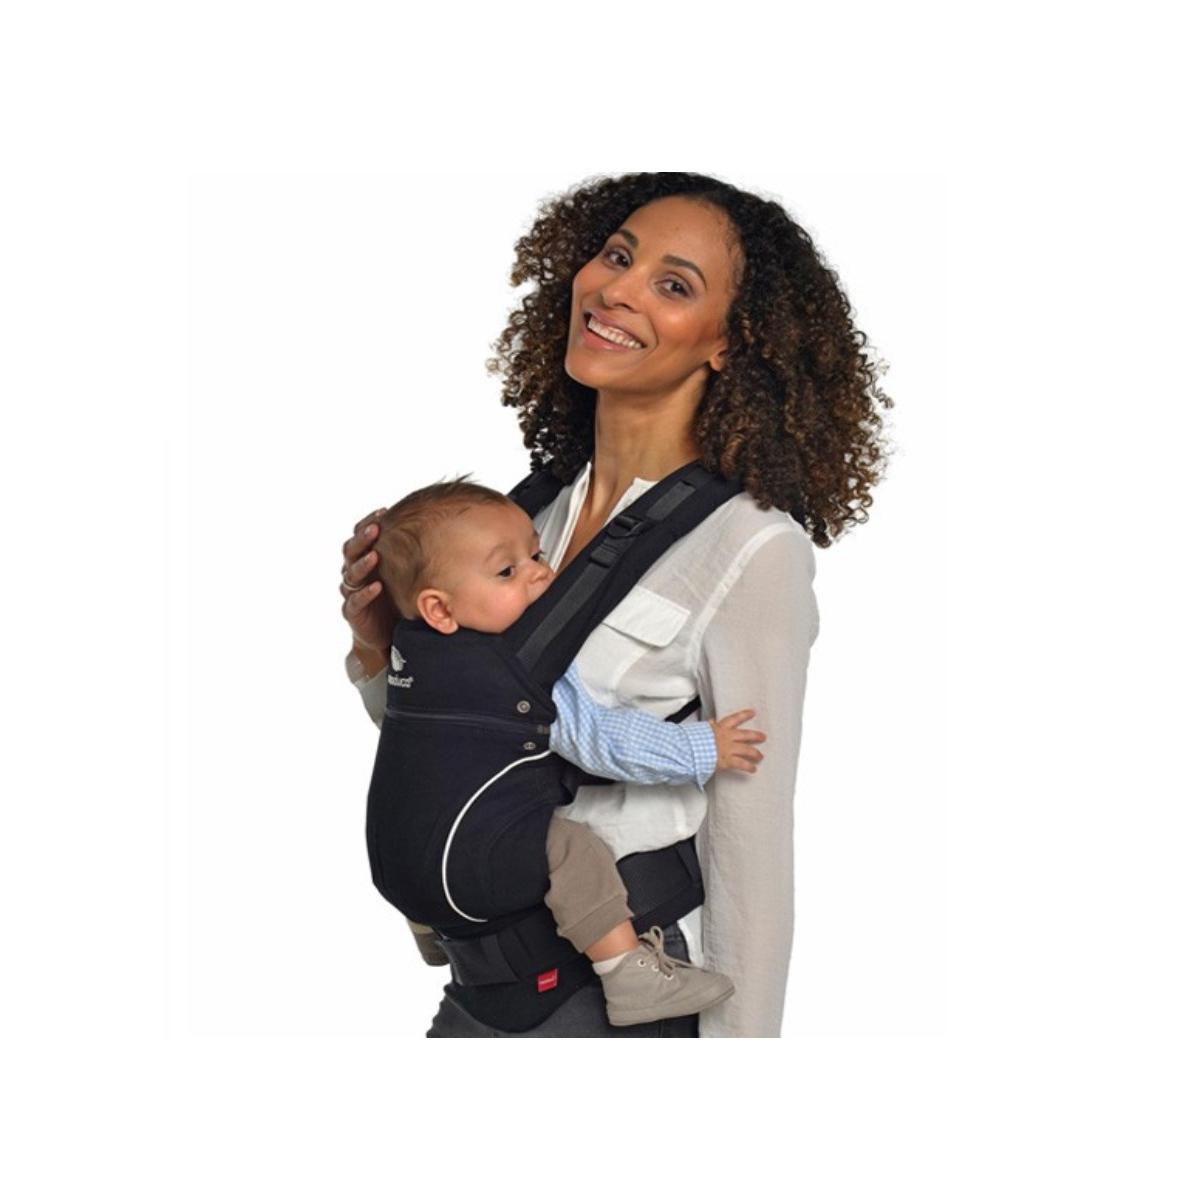 c6ec2ba4a82a Porte-bébé Baby carrier en coton BIO - Nigth black. Porte-bébé Baby carrier  en coton BIO - Nigth black